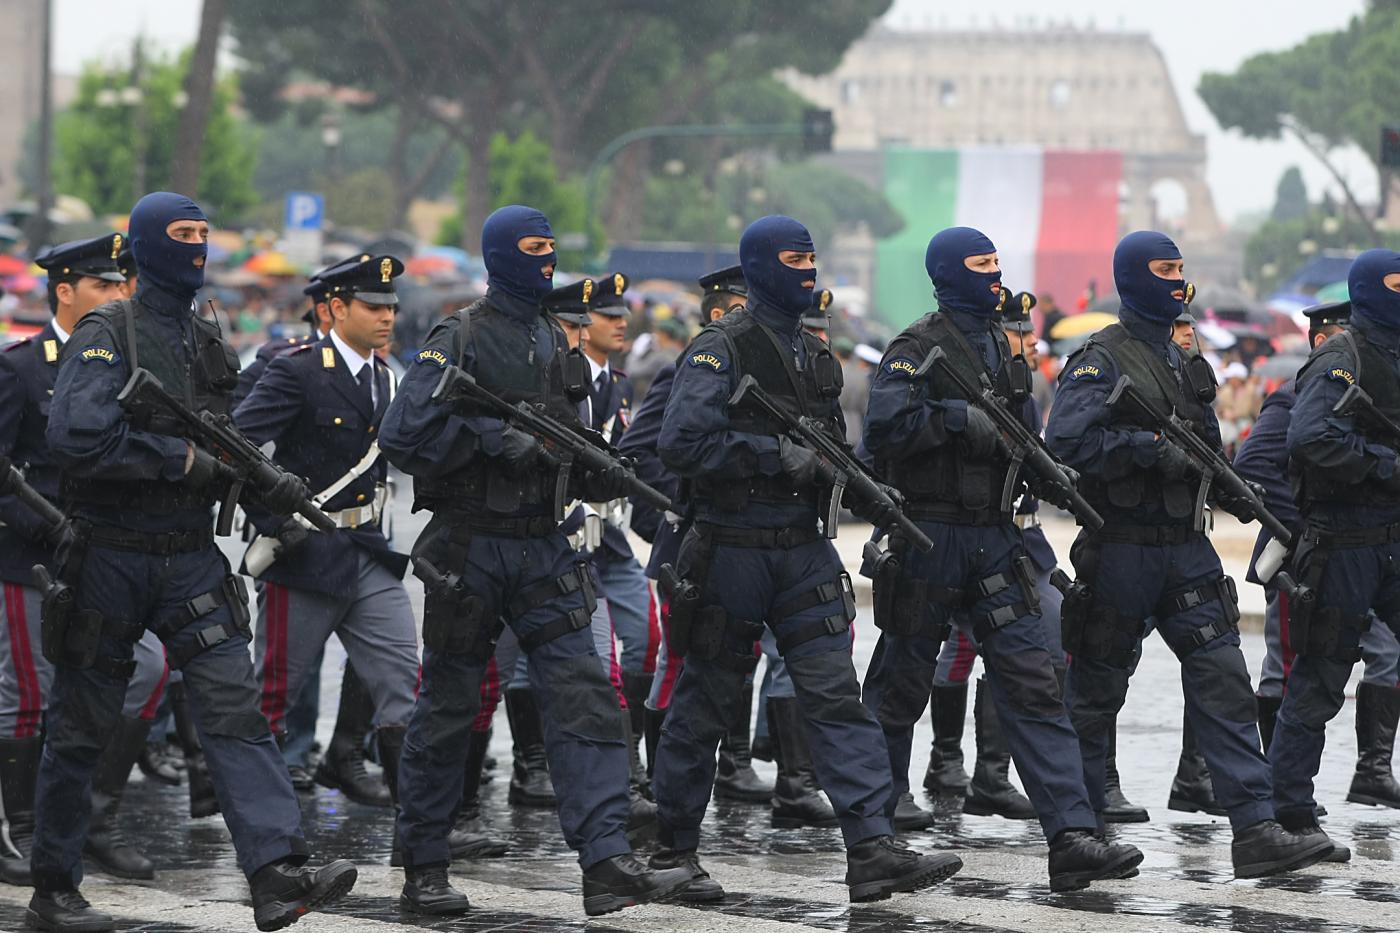 Polizia 150x150